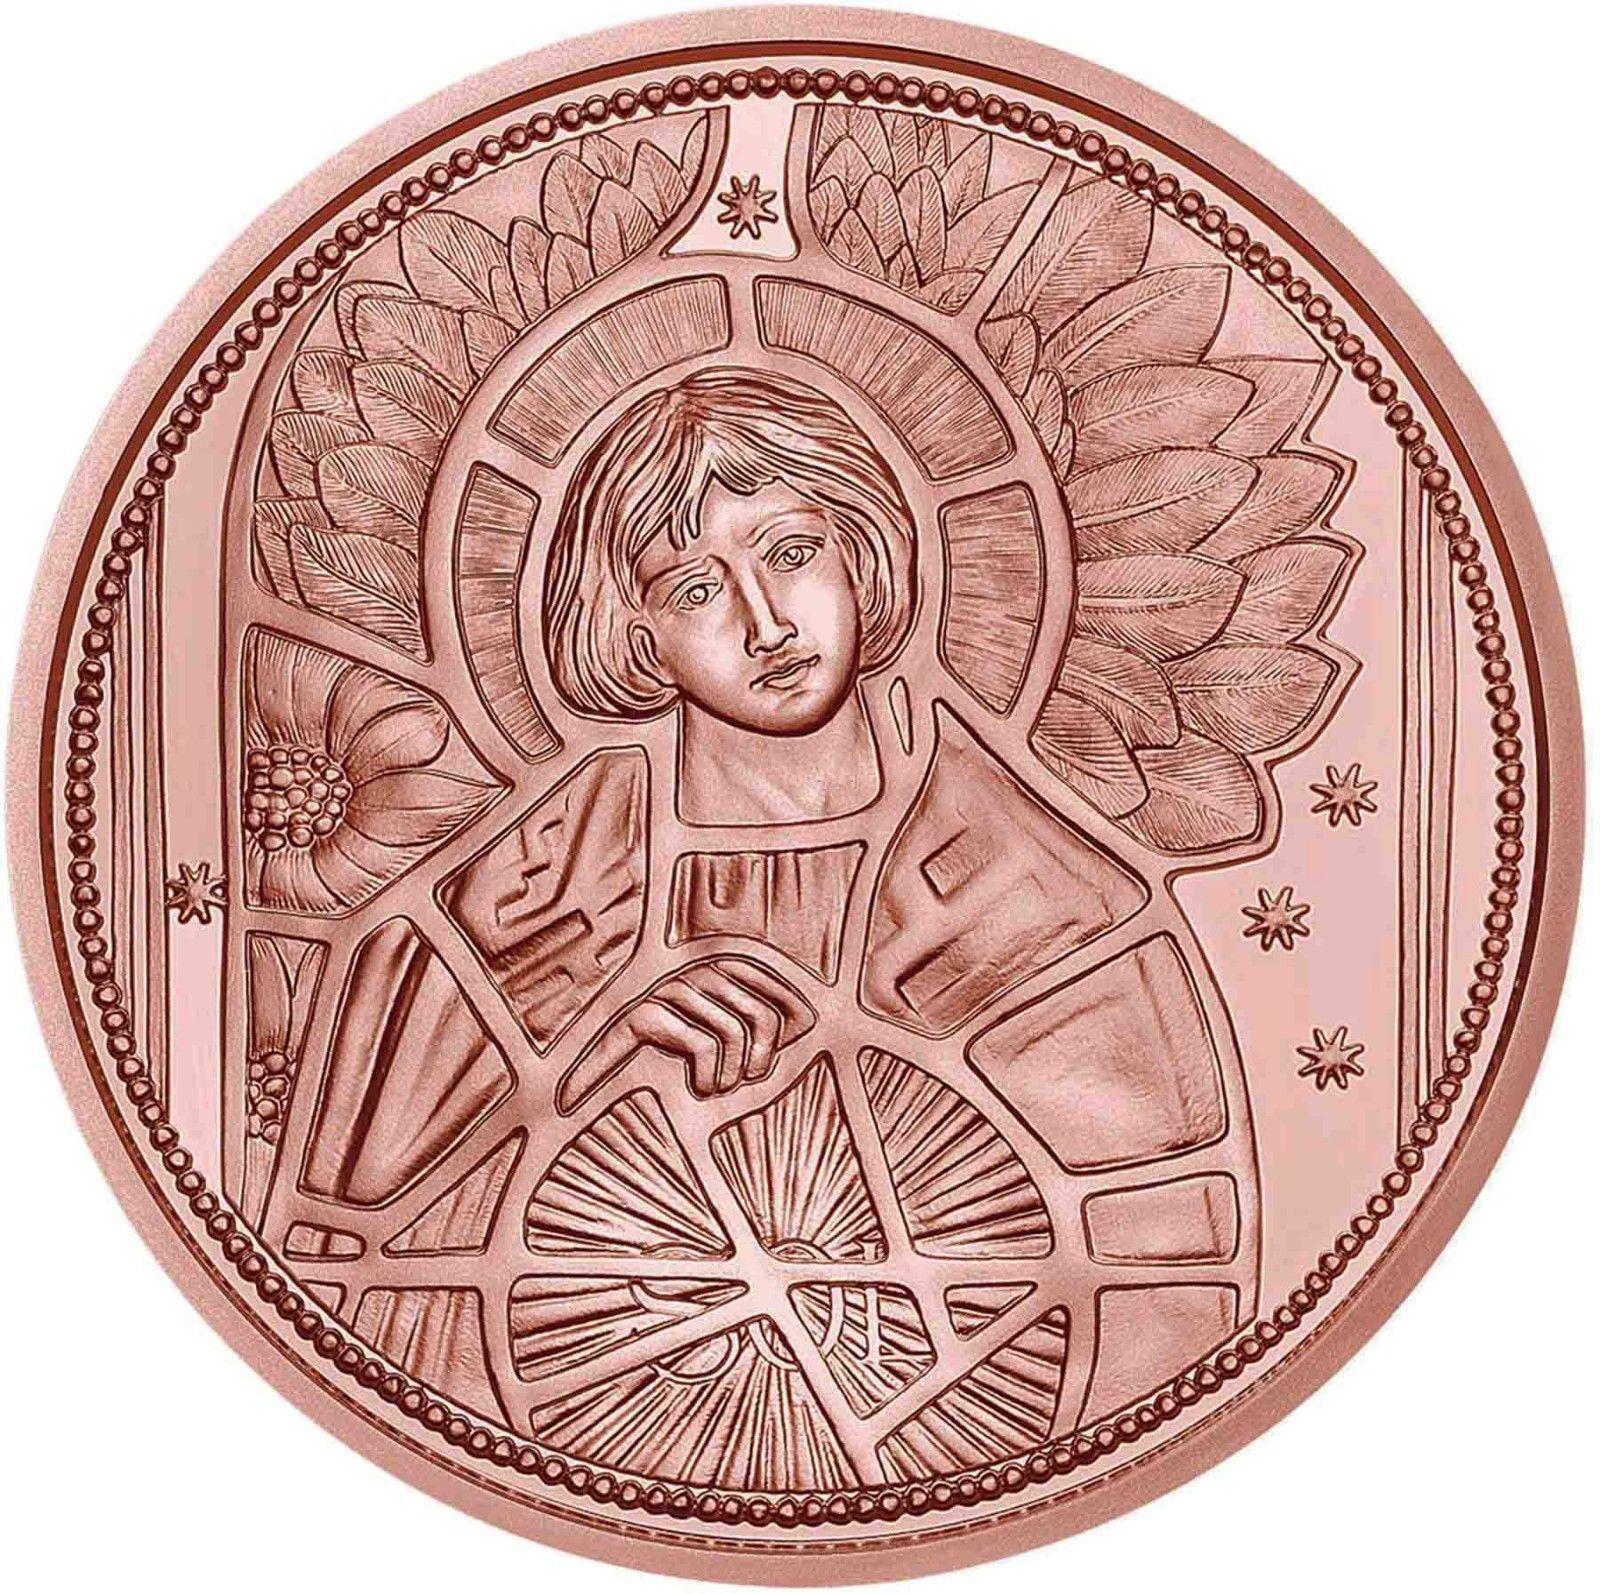 Австрия 10 евро 2018 г. Архангел Уриил